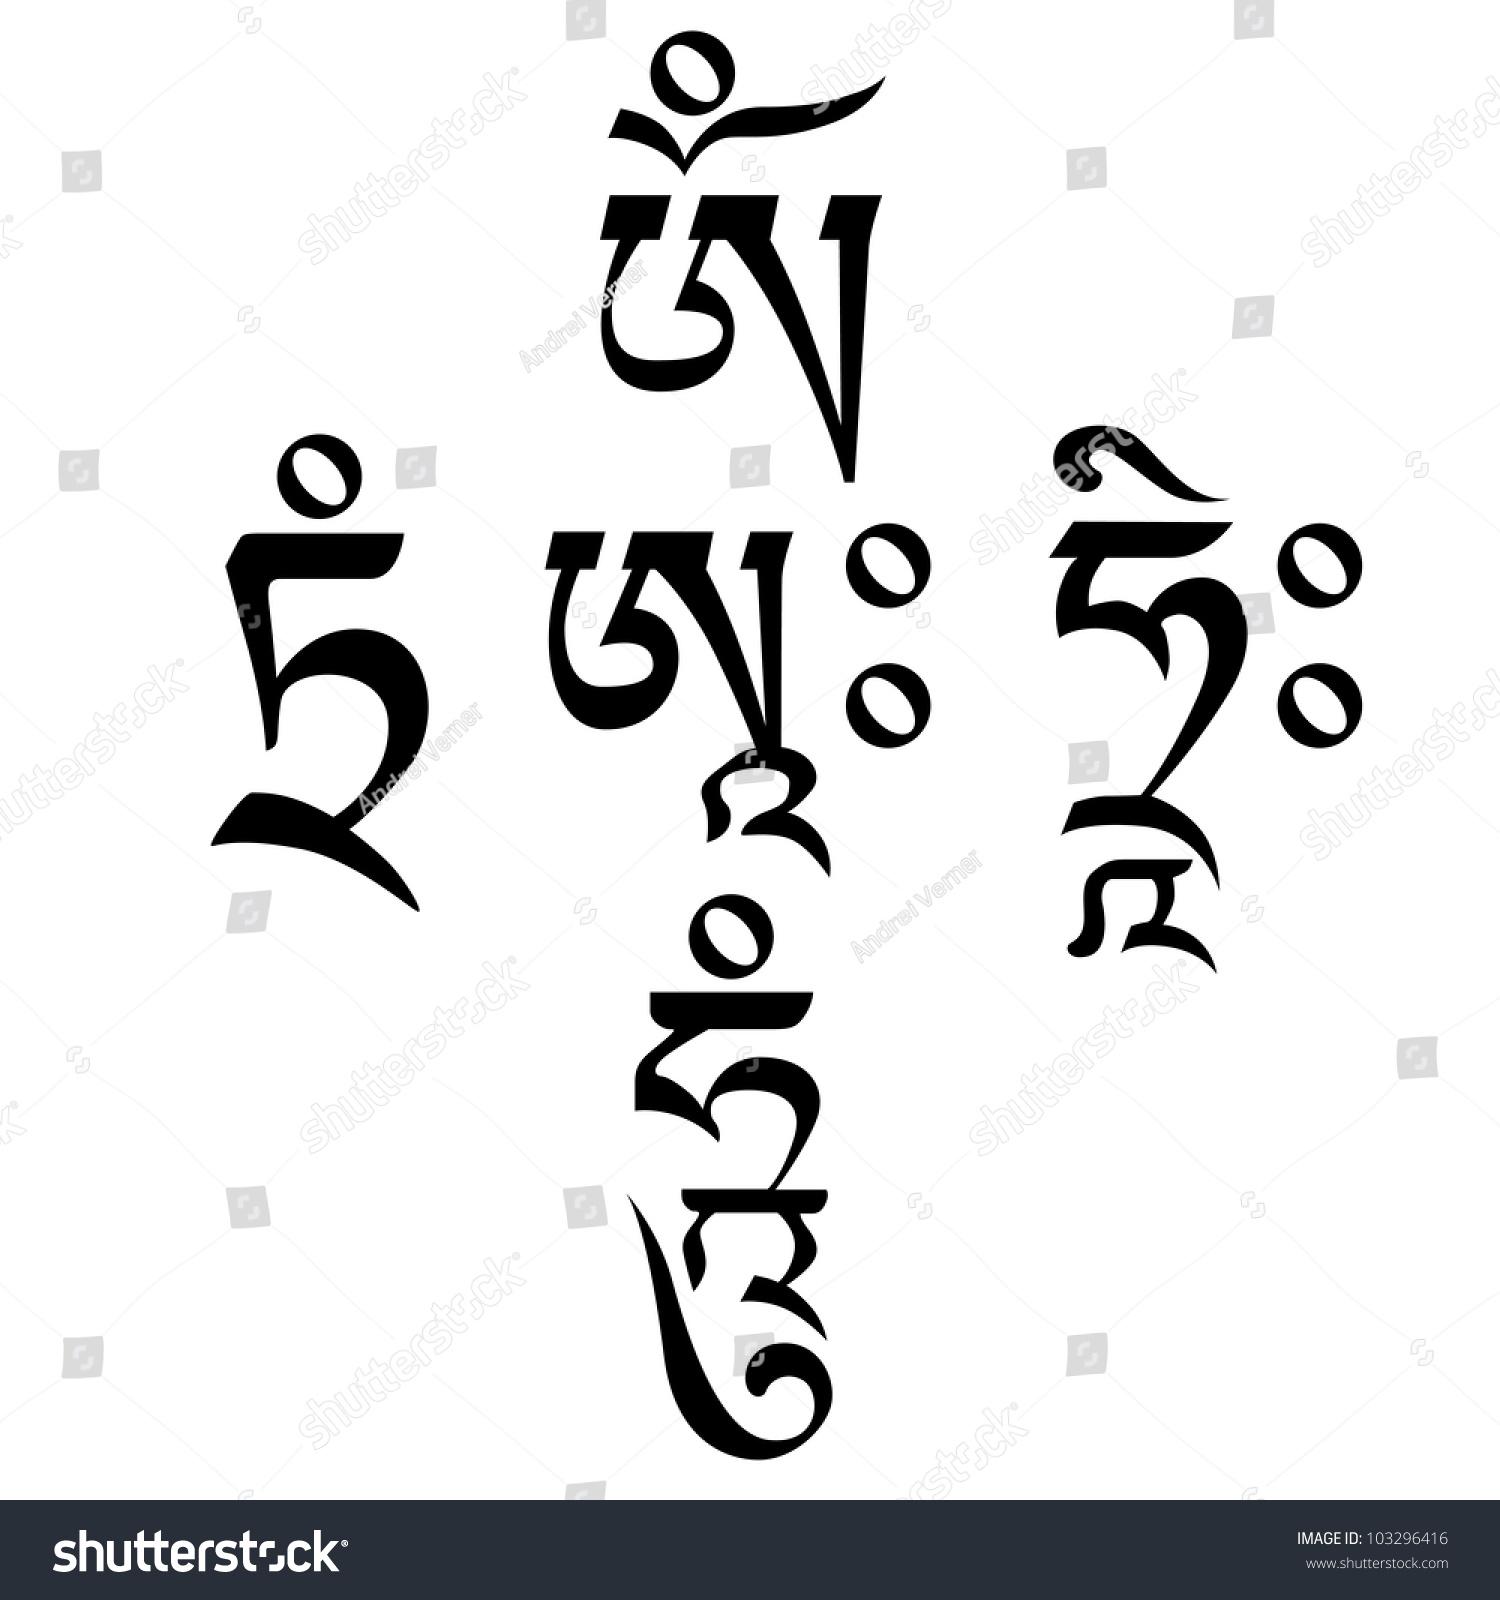 Tibetan syllables ah om hum tram stock vector 103296416 shutterstock tibetan syllables ah om hum tram and hri vector illustration buycottarizona